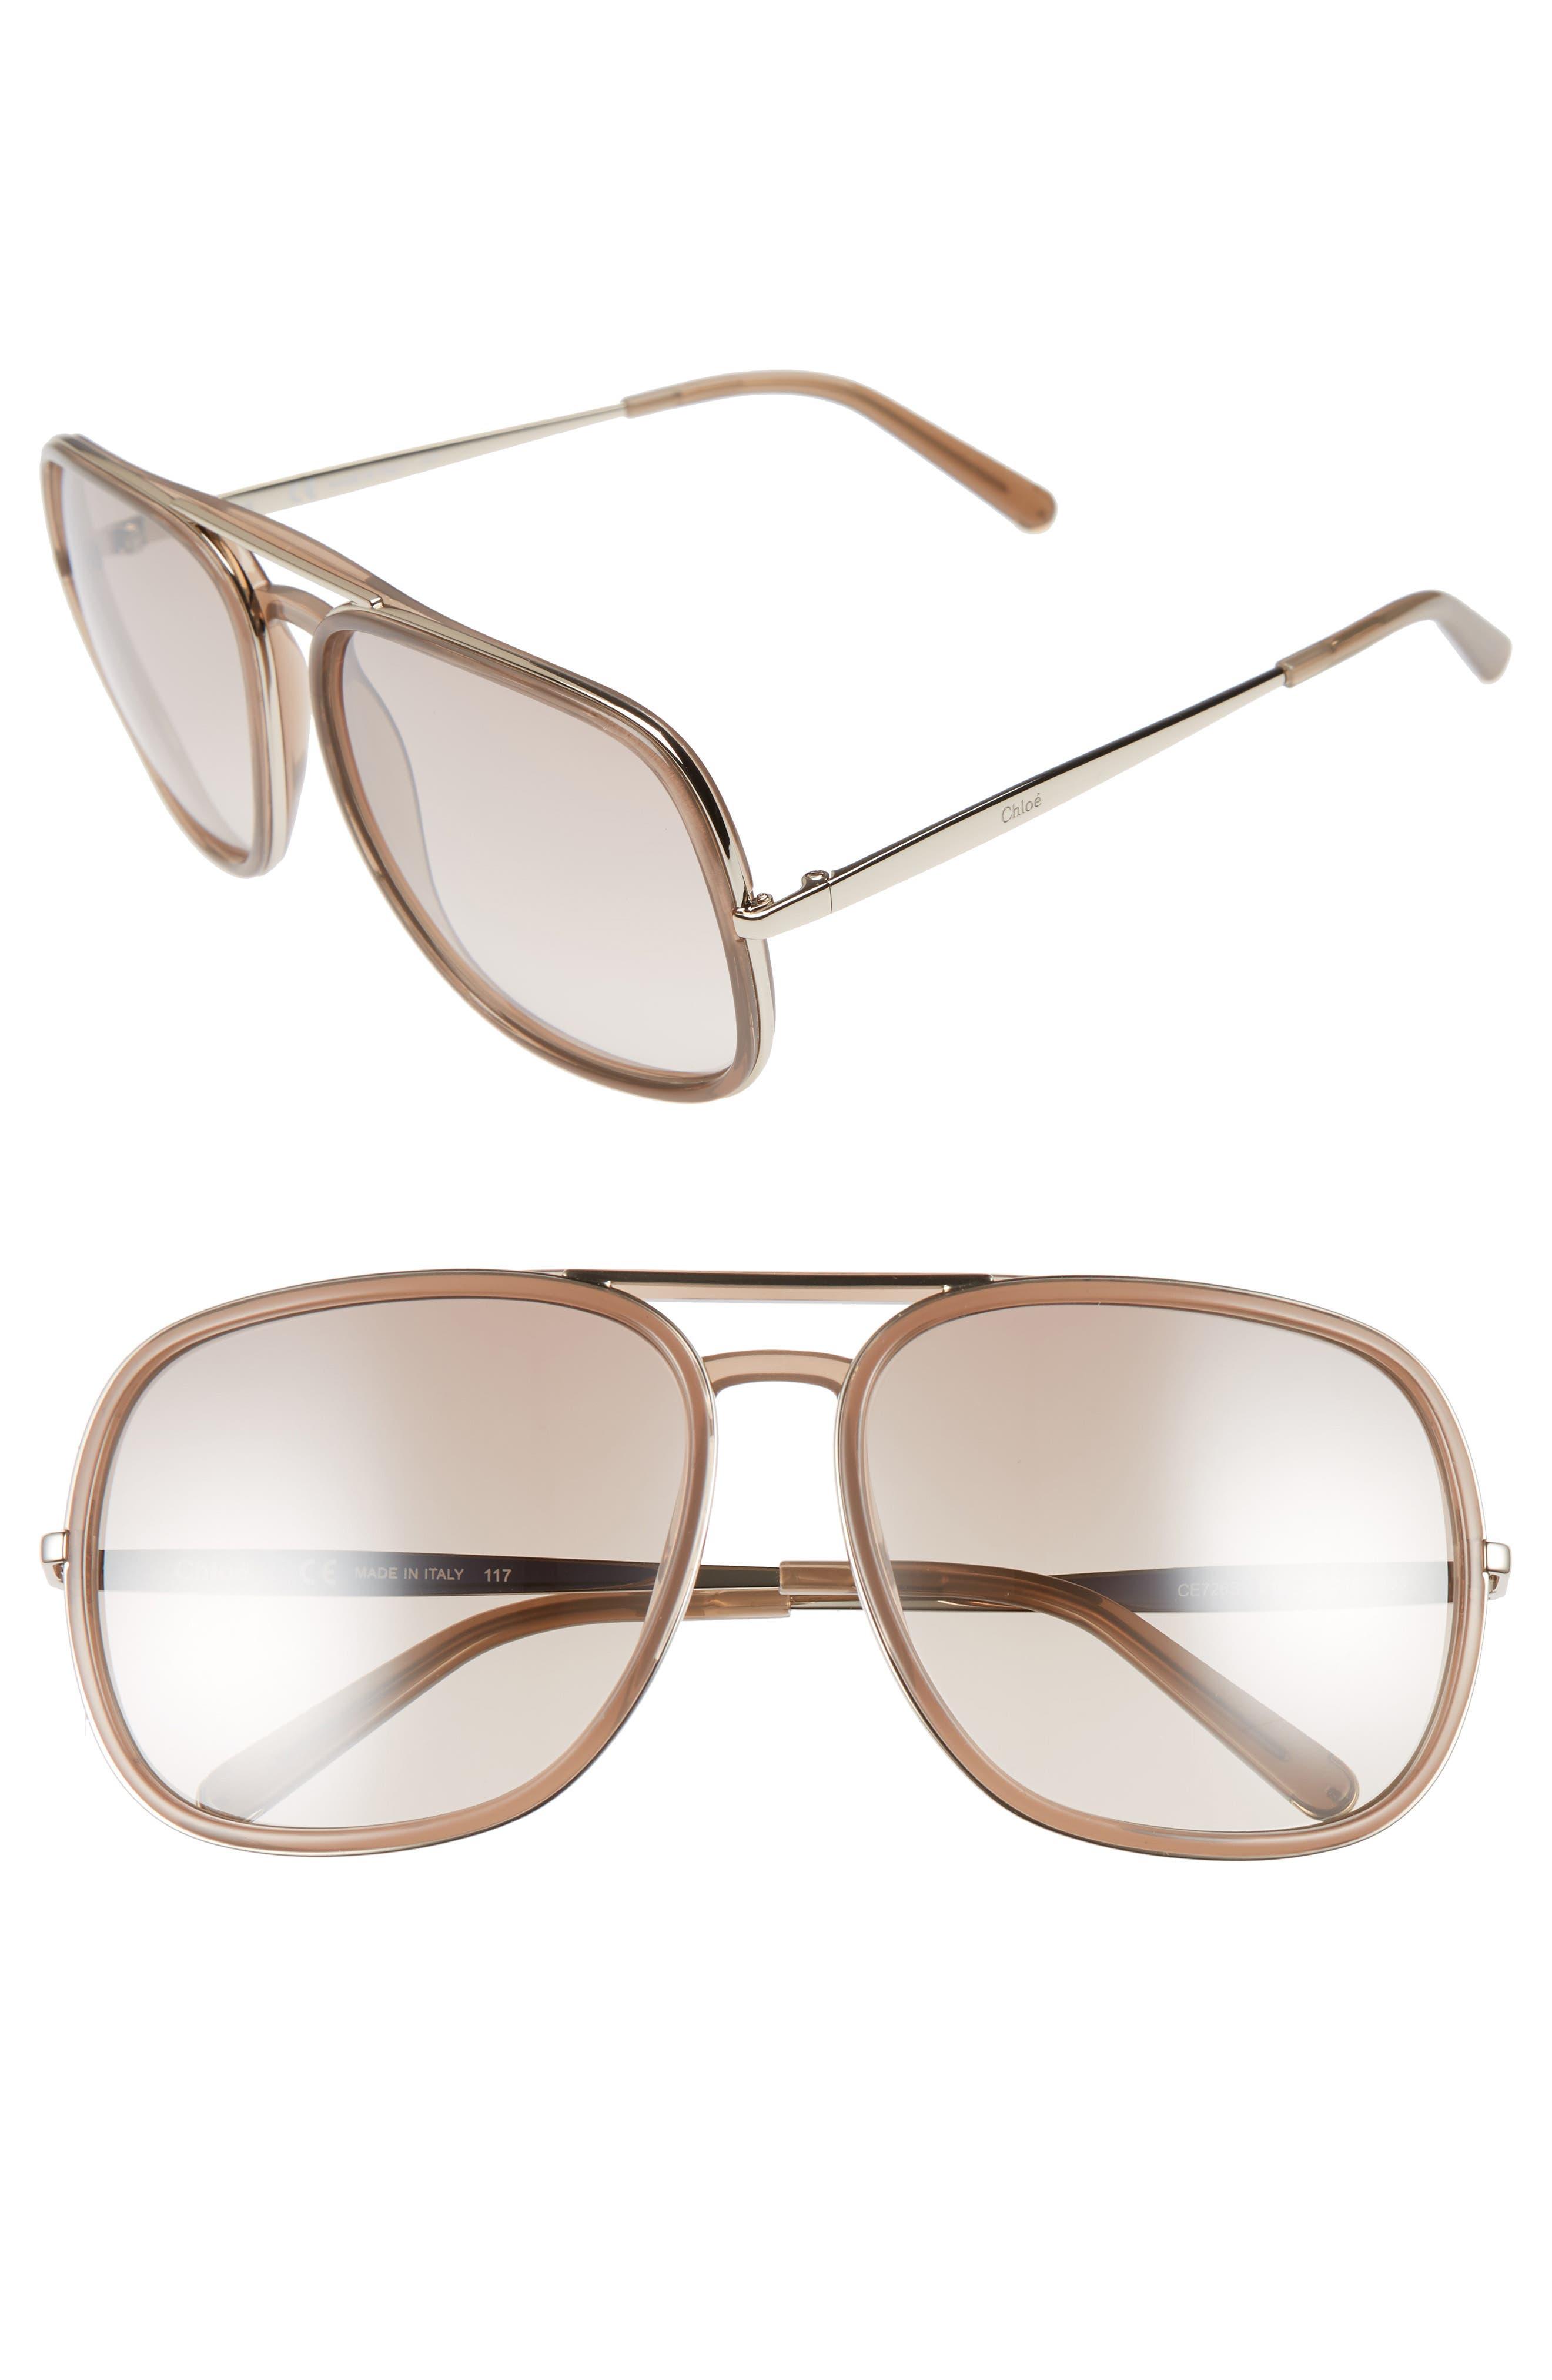 Alternate Image 1 Selected - Chloé 60mm Gradient Lens Navigator Sunglasses